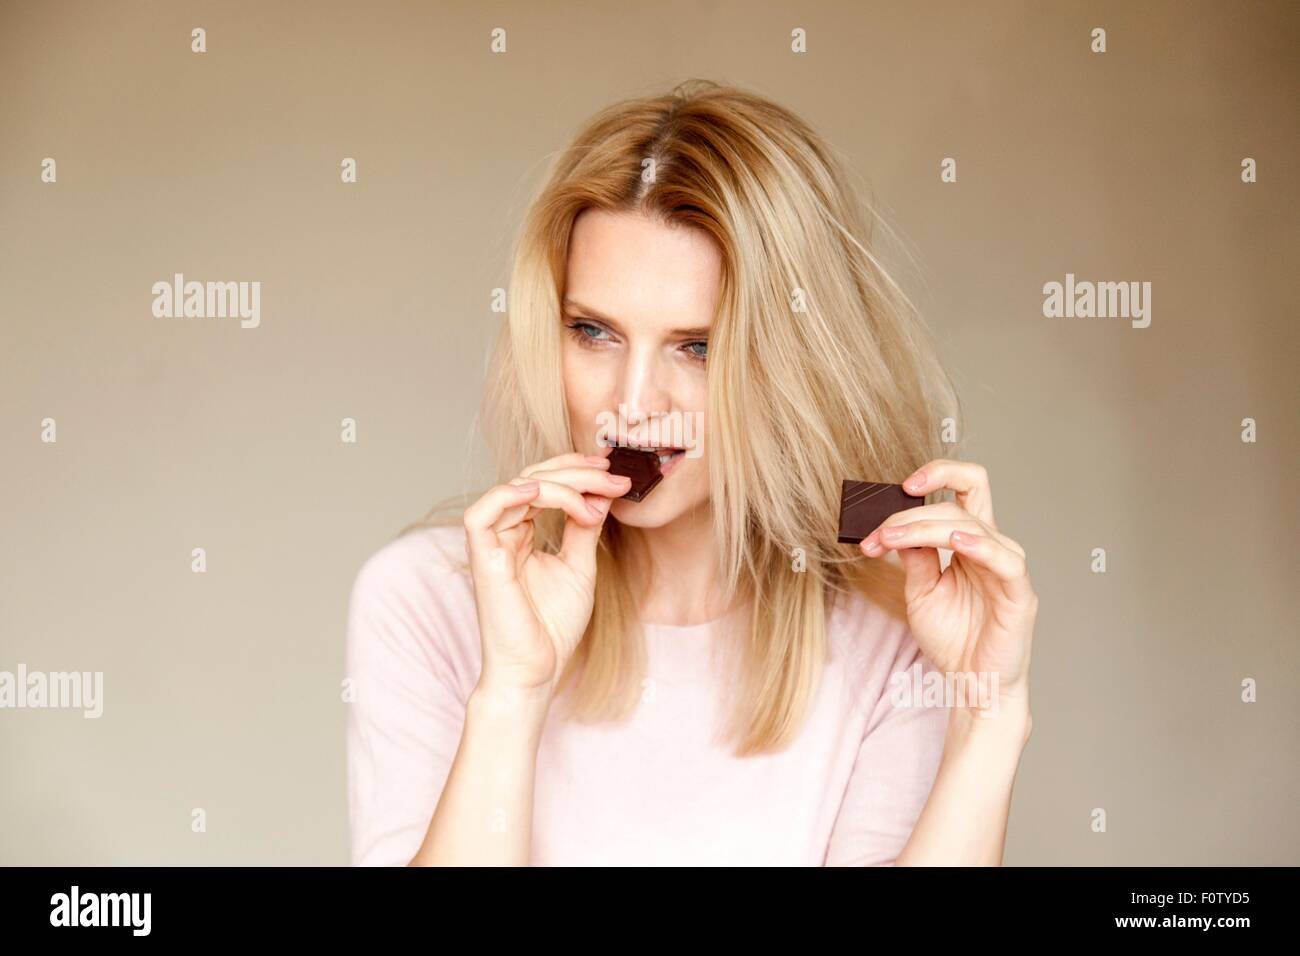 Retrato de mujer hermosa con largo pelo rubio comer chocolate bar Imagen De Stock